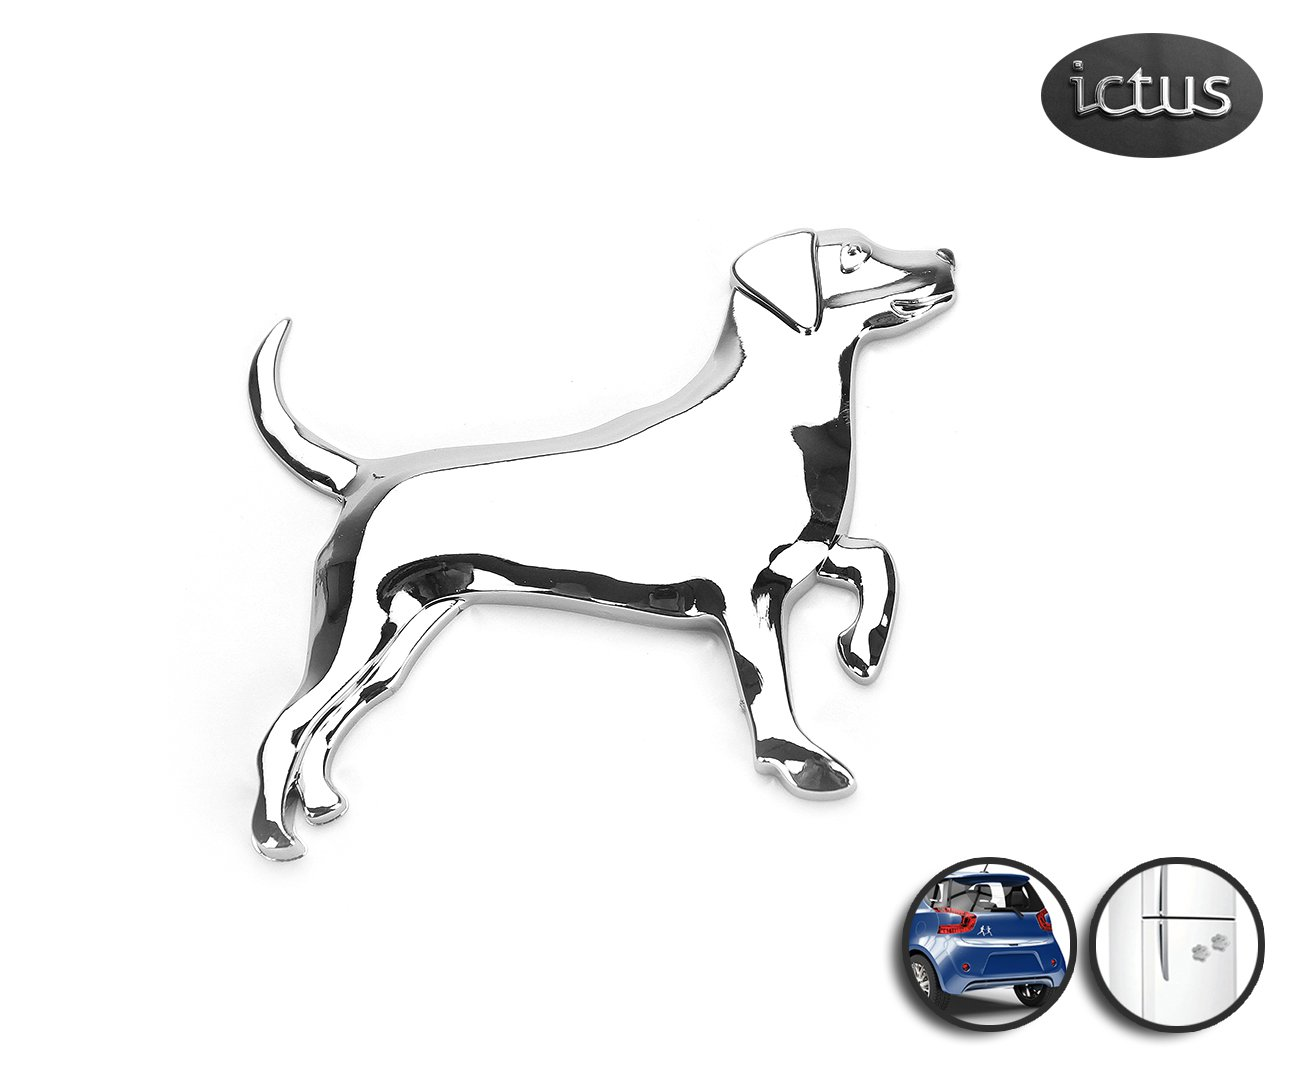 Emblema Beagle - Ictus